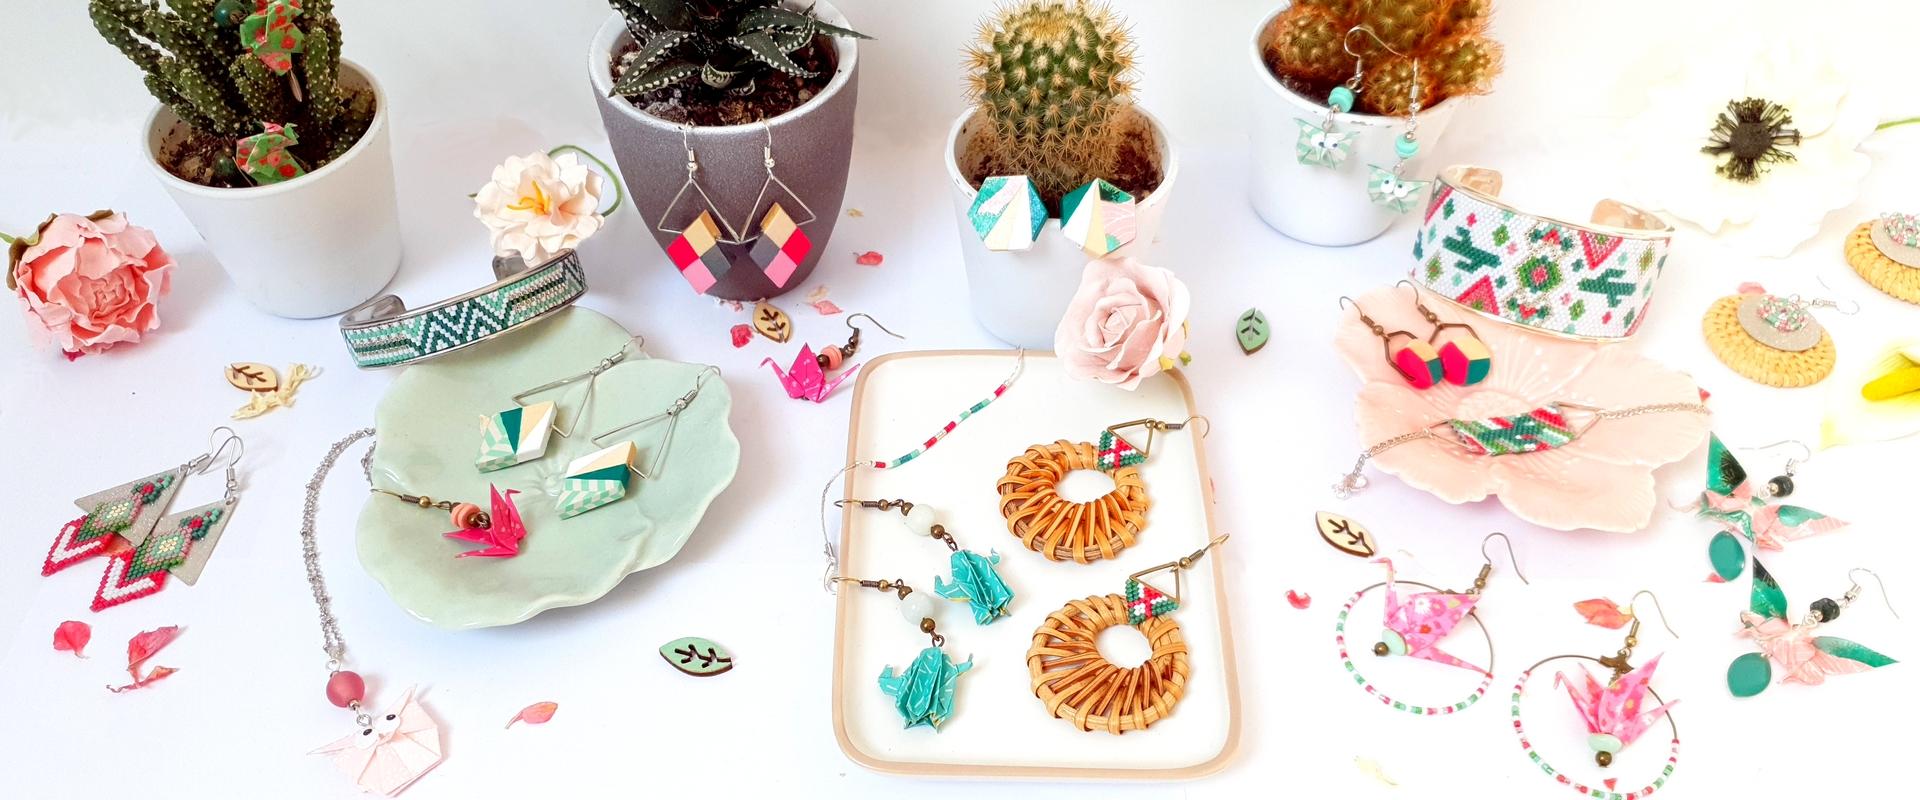 Gebetnout bijoux fantaisie lyon mode tendance bijouterie femme Annecy artisan collection printemps incahuasi rose vert cactus bolivie uyuni